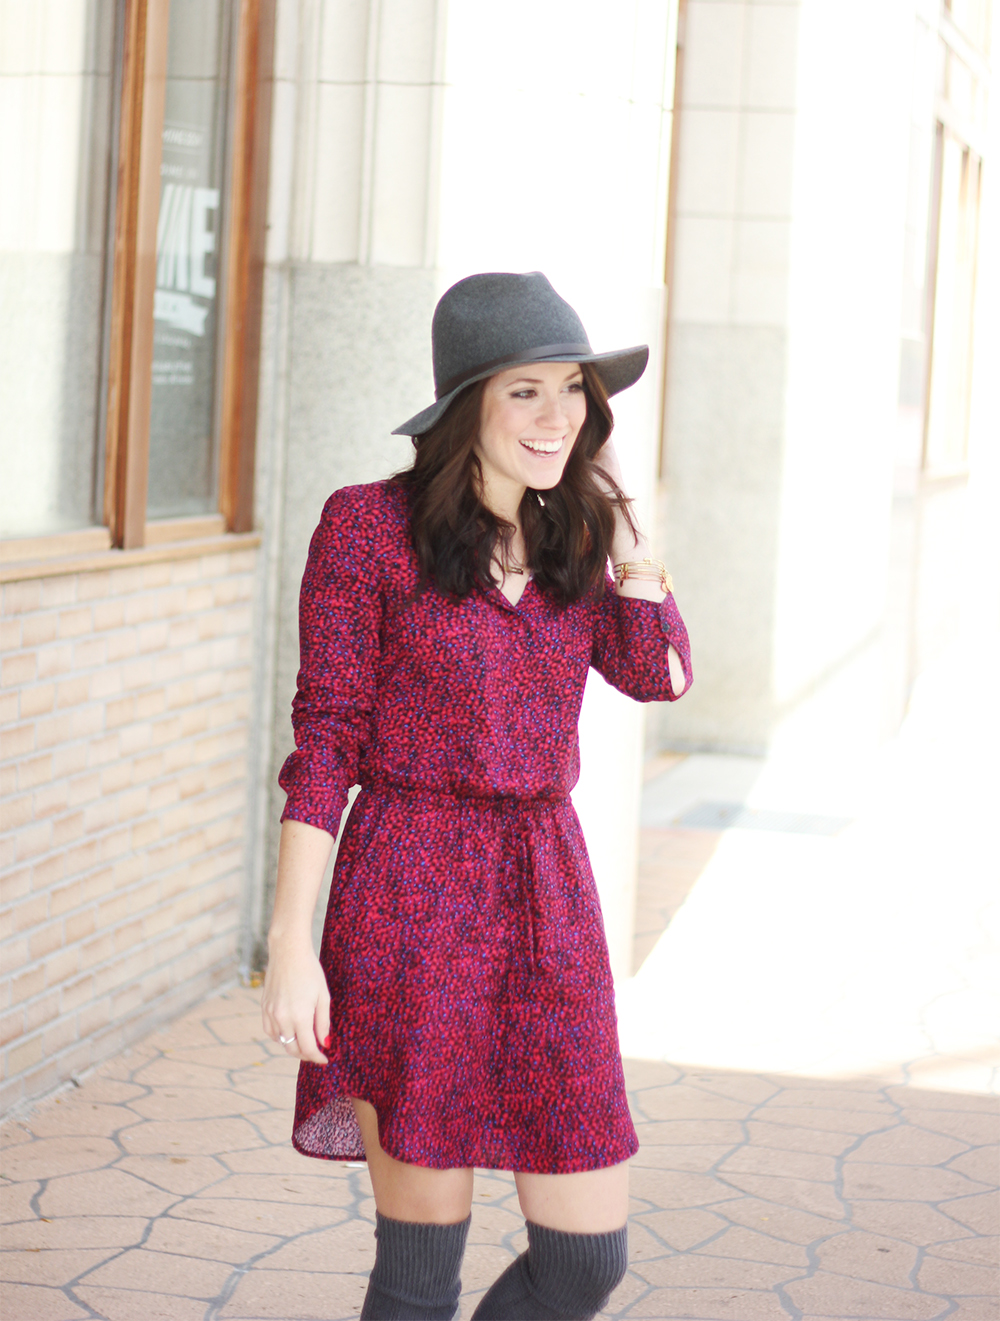 The Brunette One-Samantha McClelland-Well Dressed Creative-Lauren Kelp_01